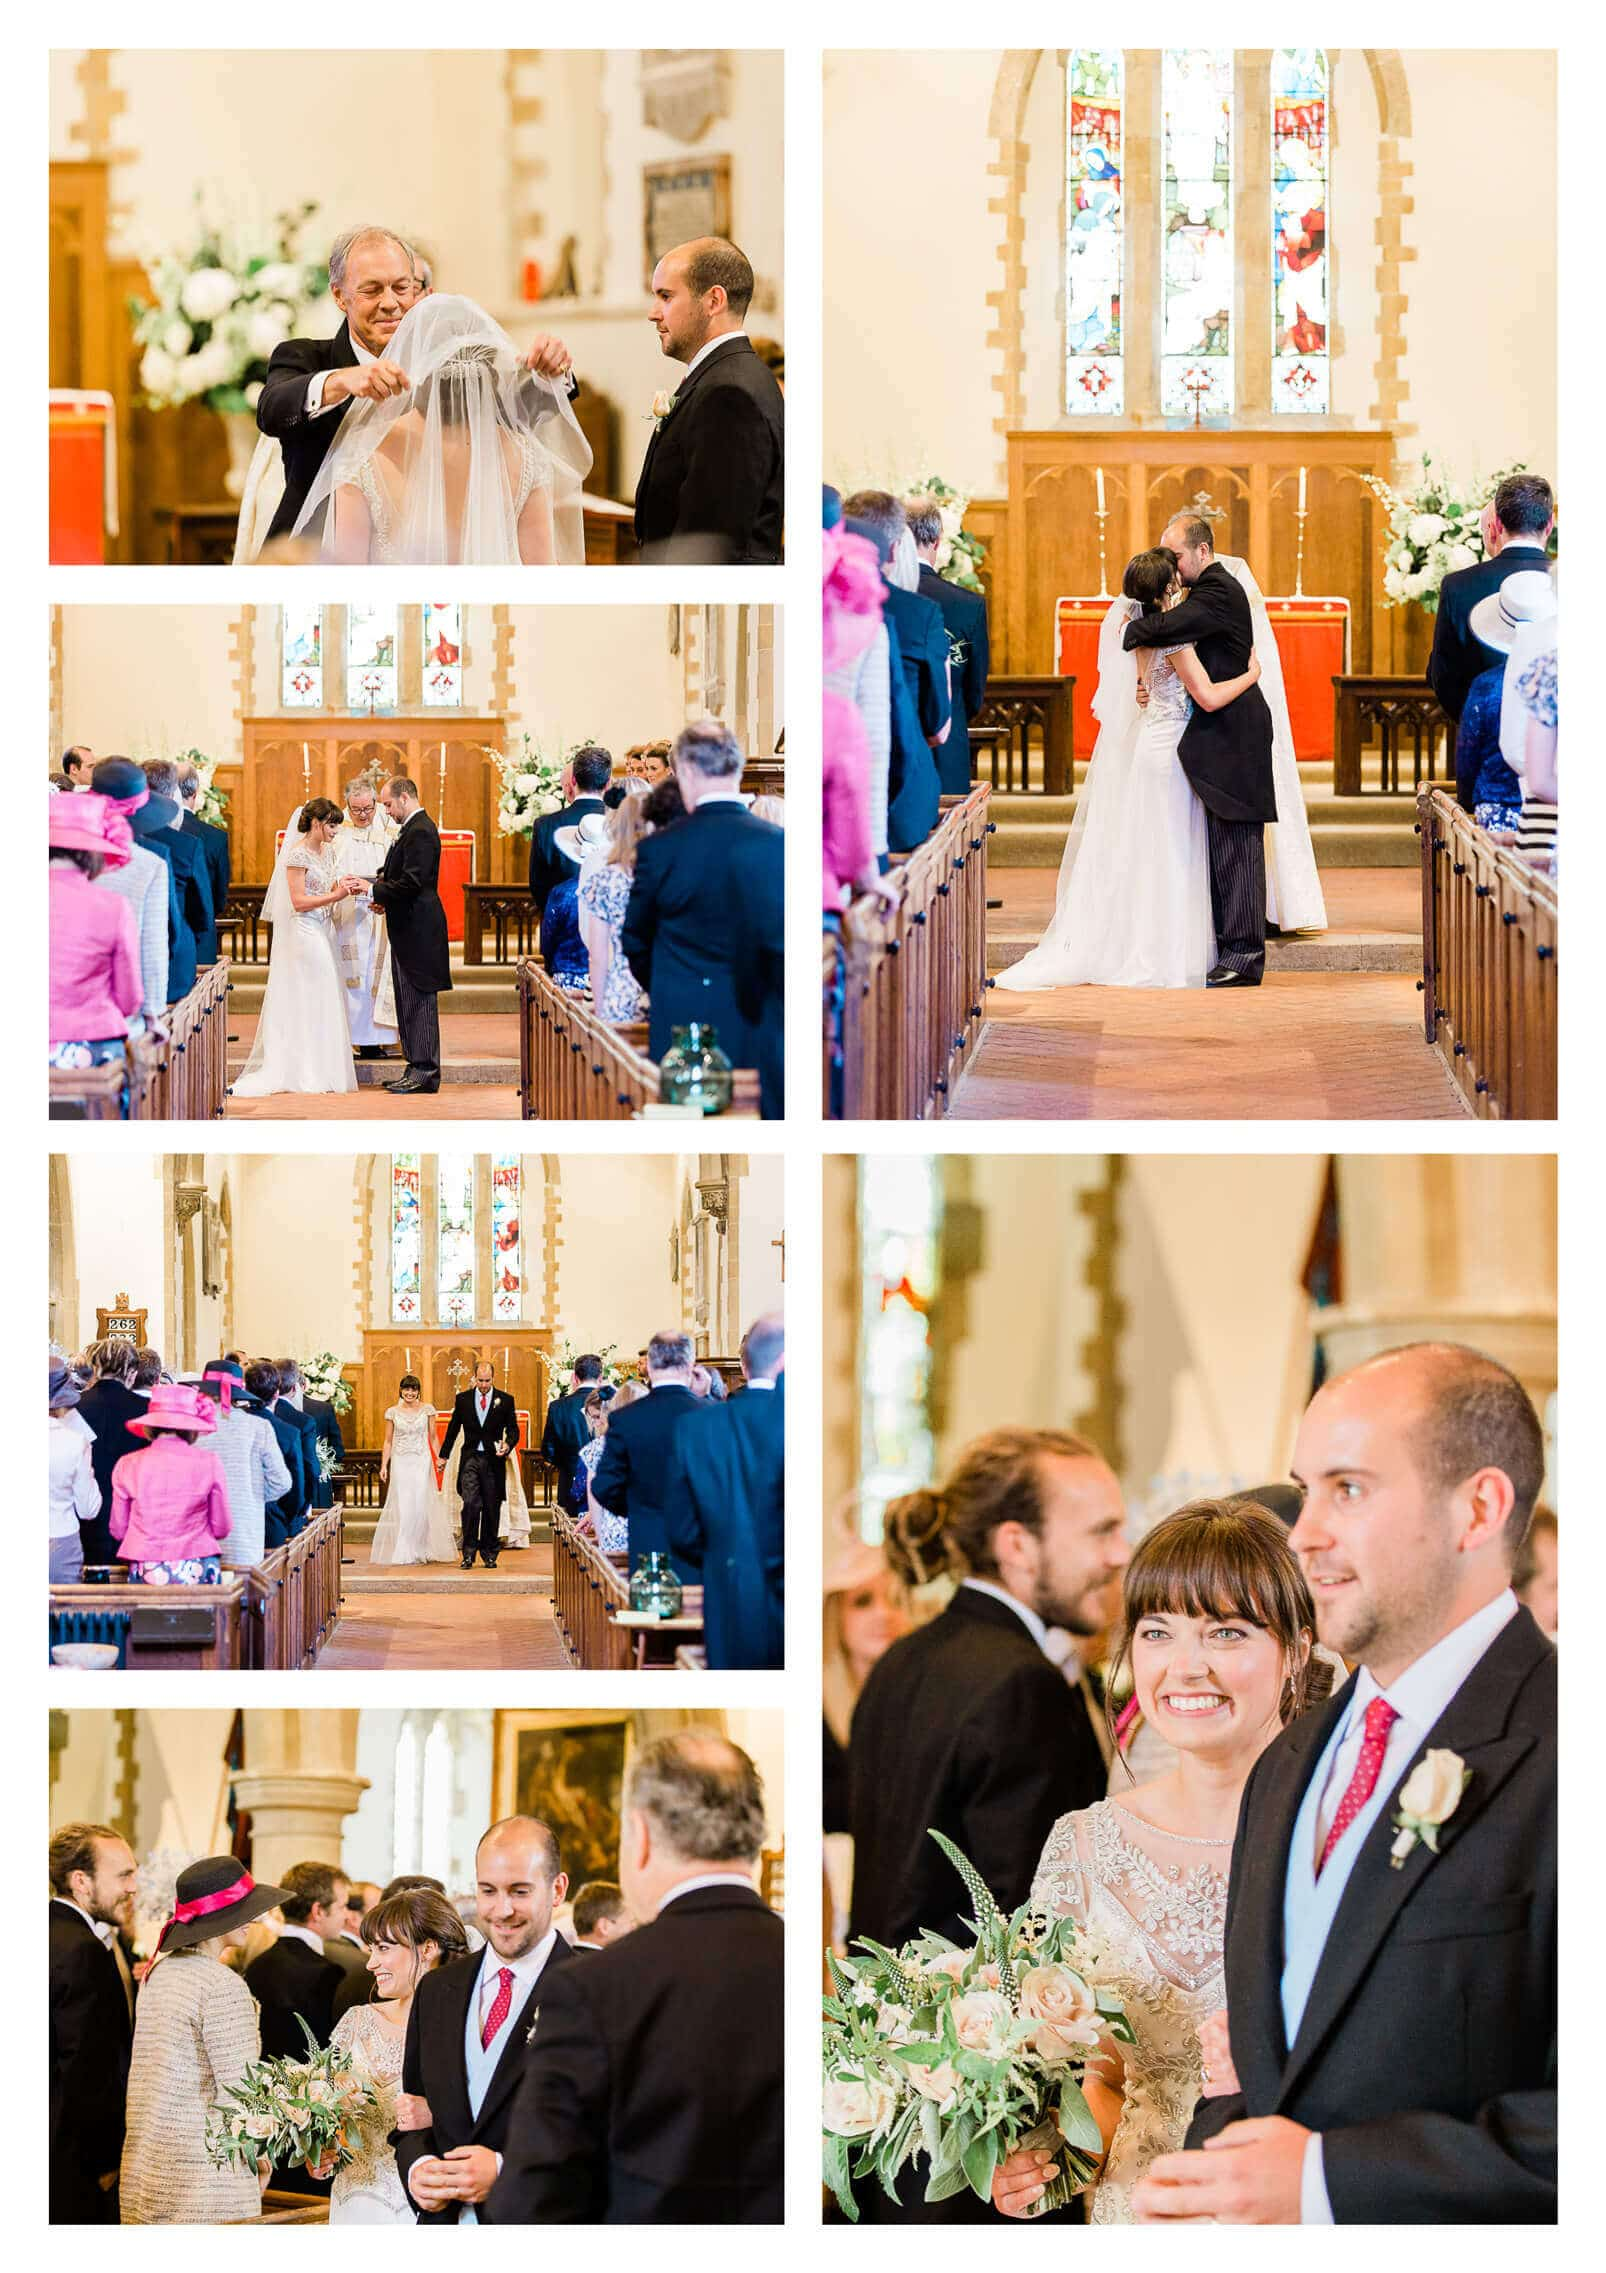 St James Church wedding ceremony in Stedham West Sussex Photographer